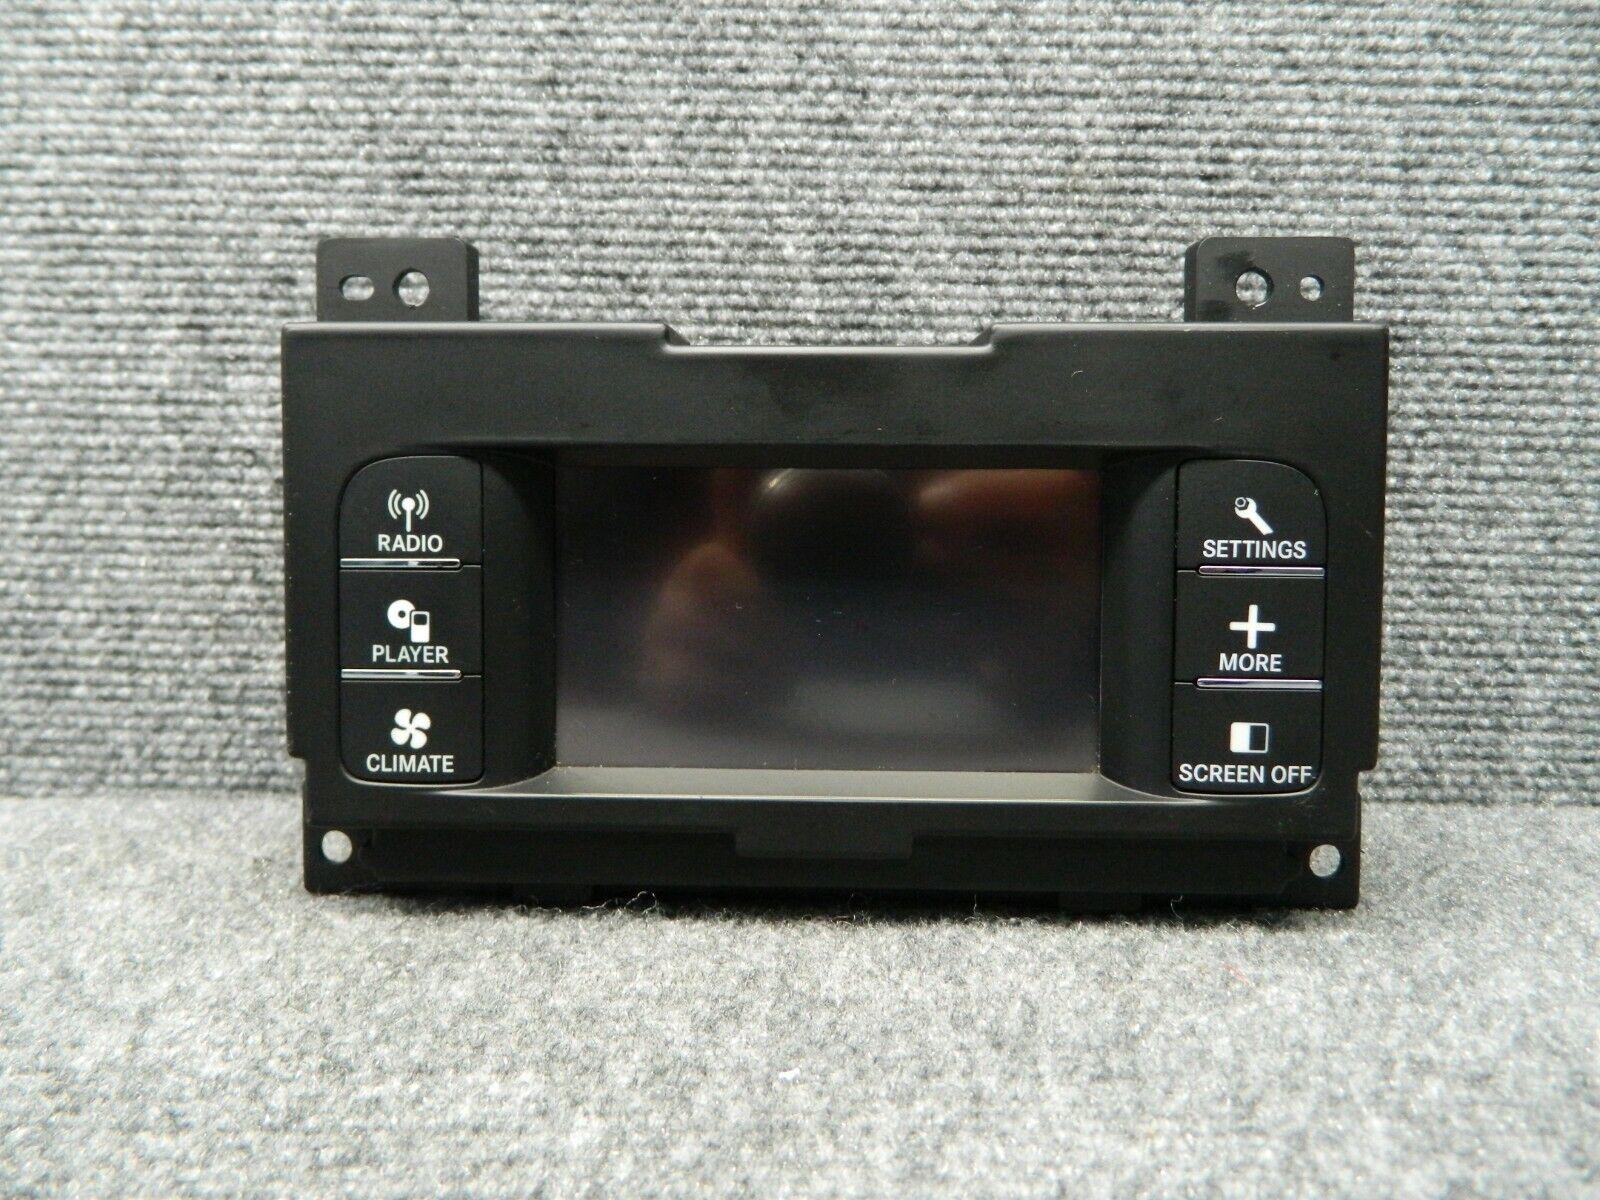 2011 2012 11 12 Chrysler 300 Radio AC Heat Climate Control Information Screen